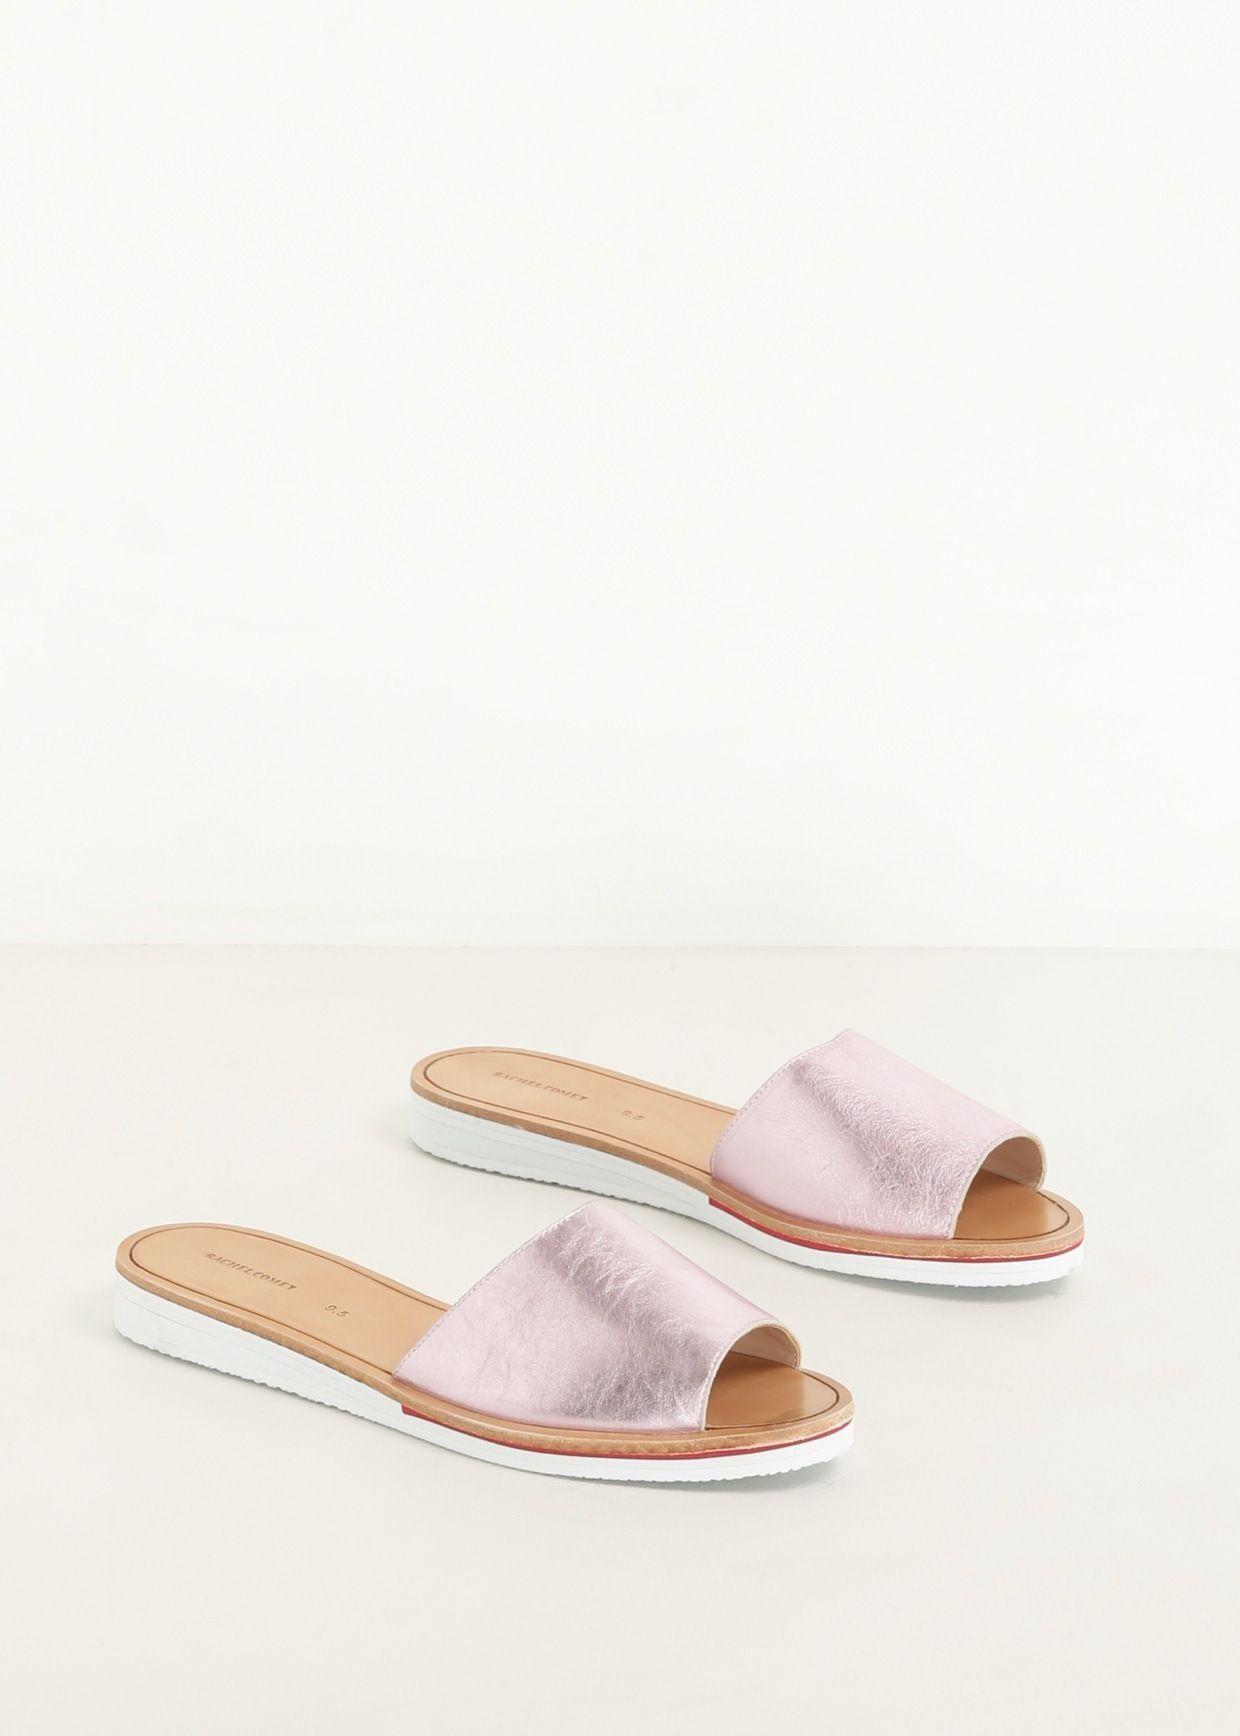 Rachel Comey Metallic Slide Sandals cheap sale store free shipping nicekicks cheap sale genuine KbustFgC6